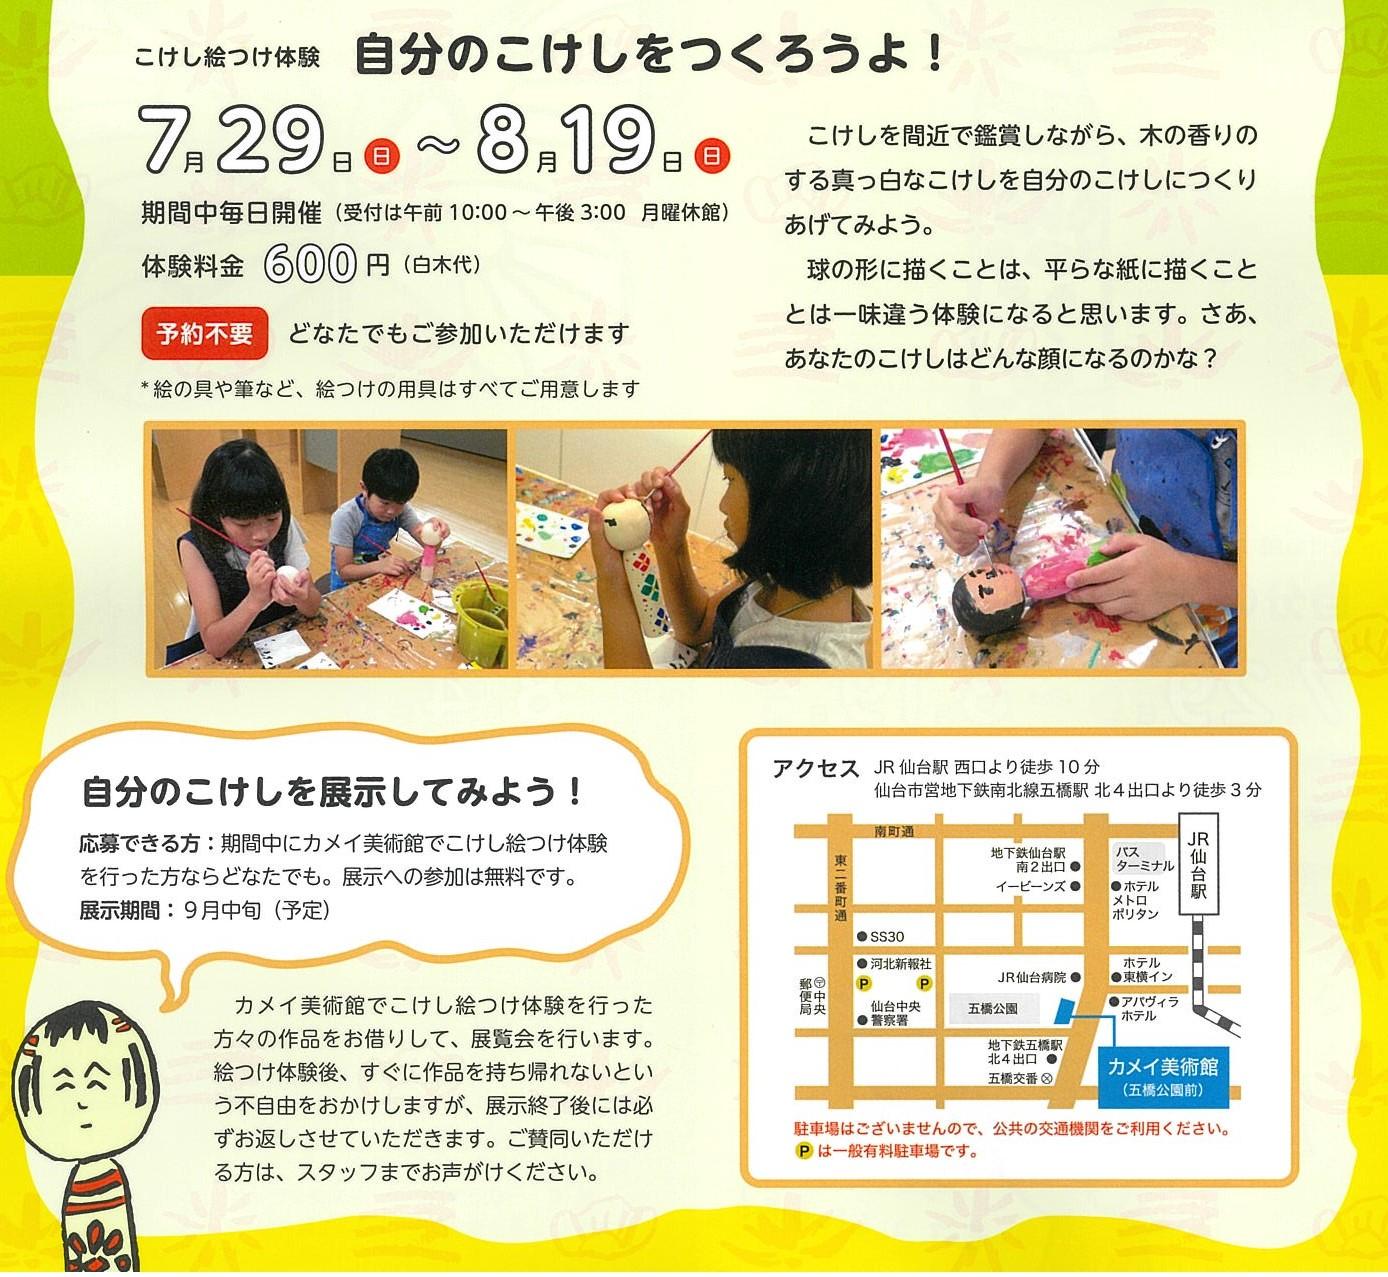 http://www.kameimuseum.or.jp/topics/%E3%81%93%E3%81%91%E3%81%97%E7%B5%B5%E4%BB%98%E3%81%91%E3%80%80%E3%83%81%E3%83%A9%E3%82%B7.jpg